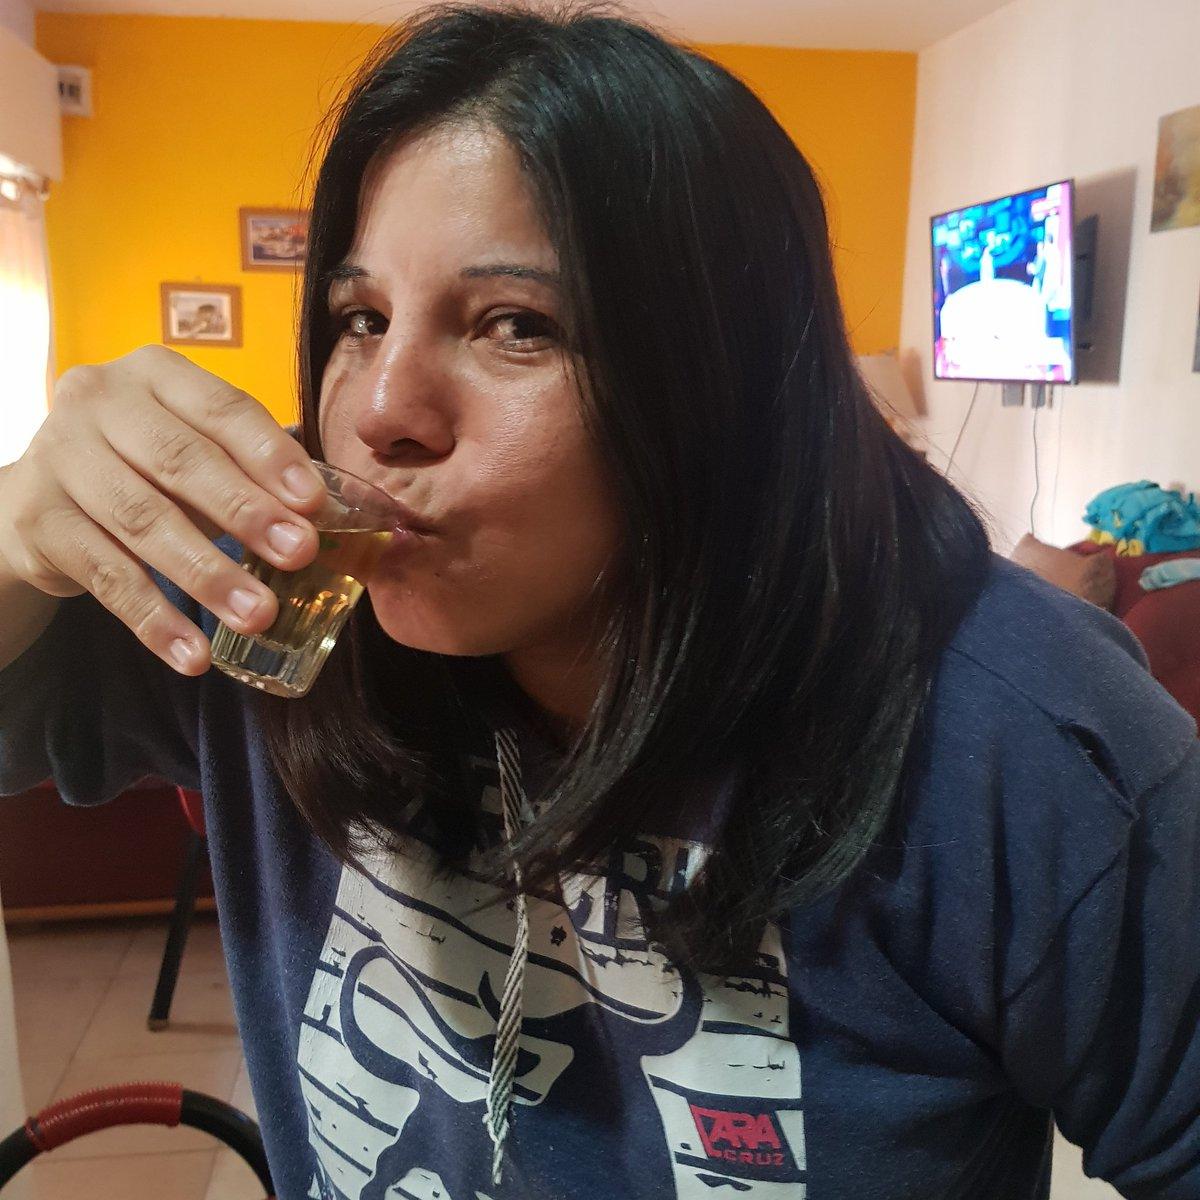 RT @NatyNatOk: Feliz día de la #Pachamama   #MadreTierra  #CanaConRuda  #1DeAgosto  #NatyNat https://t.co/ZnJ8y4ydtv